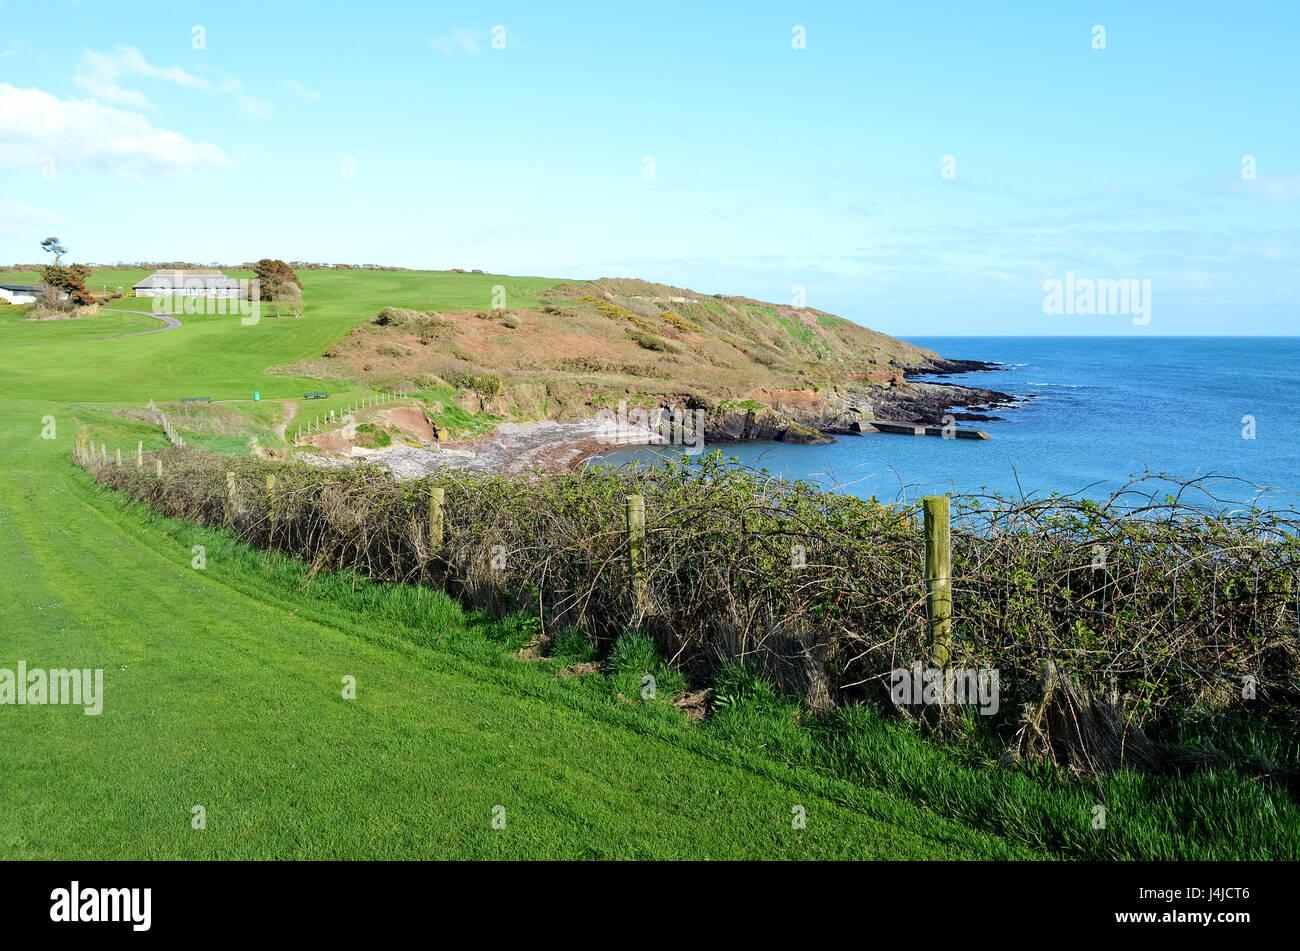 the coast at trabolgan in county cork, ireland - Stock Image